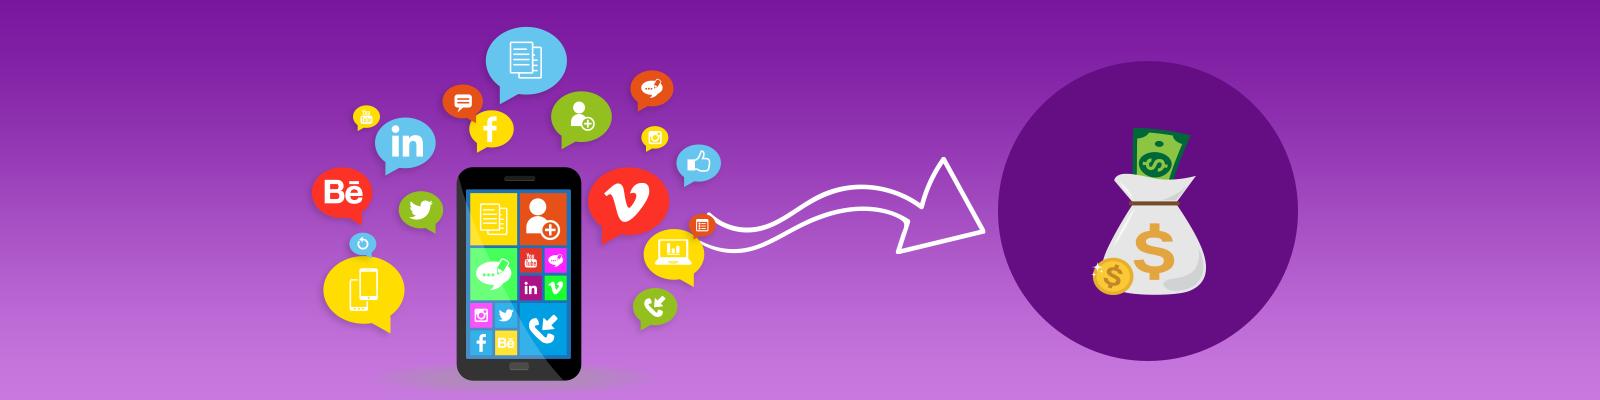 mobile app development company uae